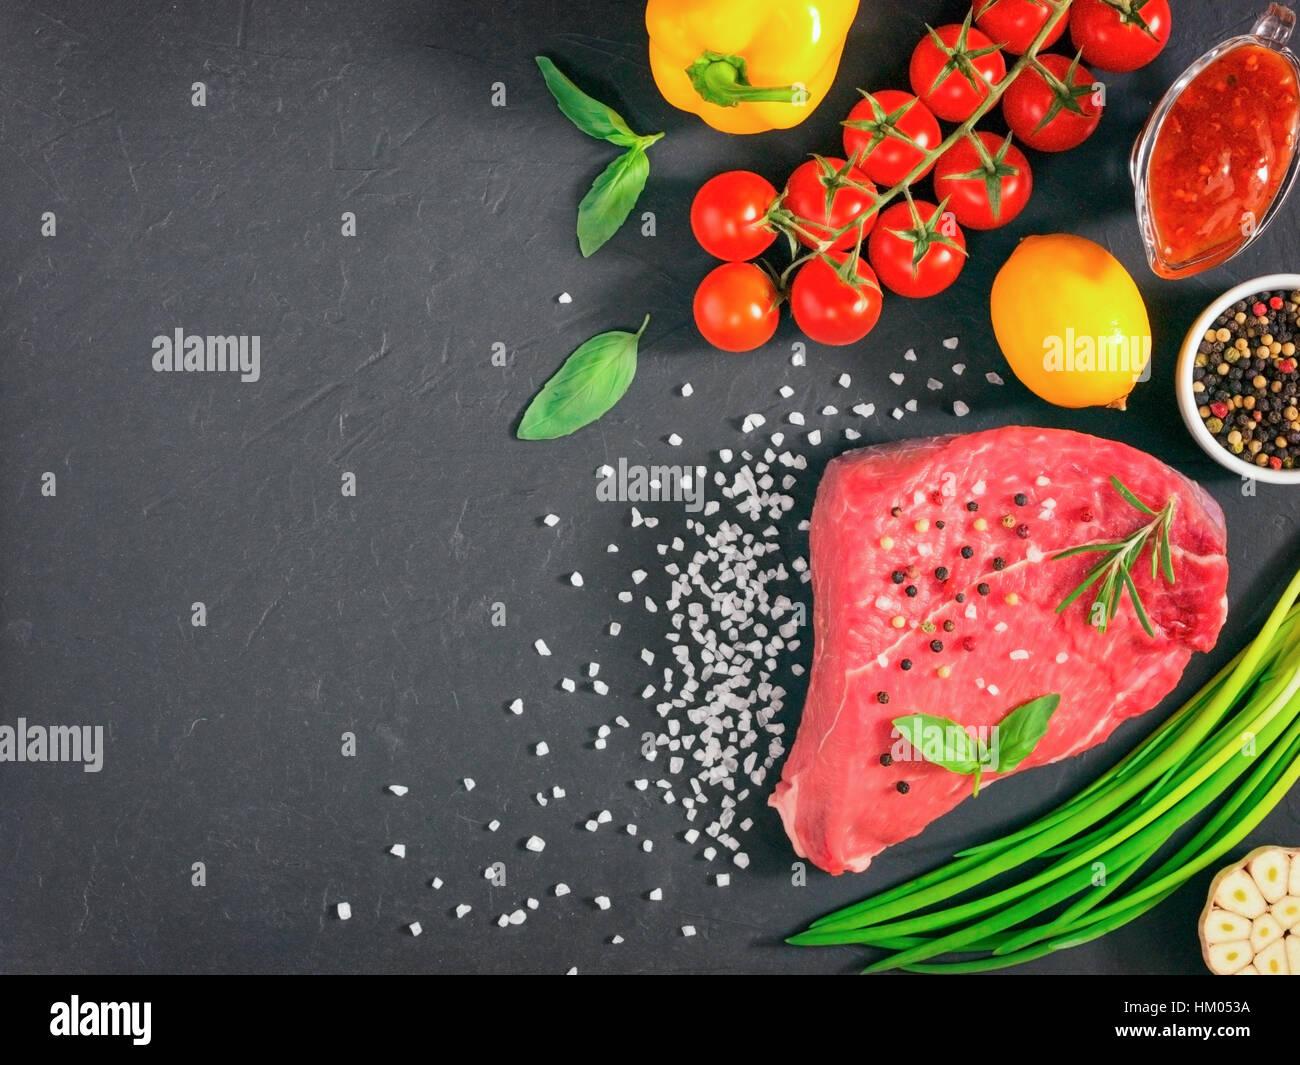 raw meat on dark background - Stock Image